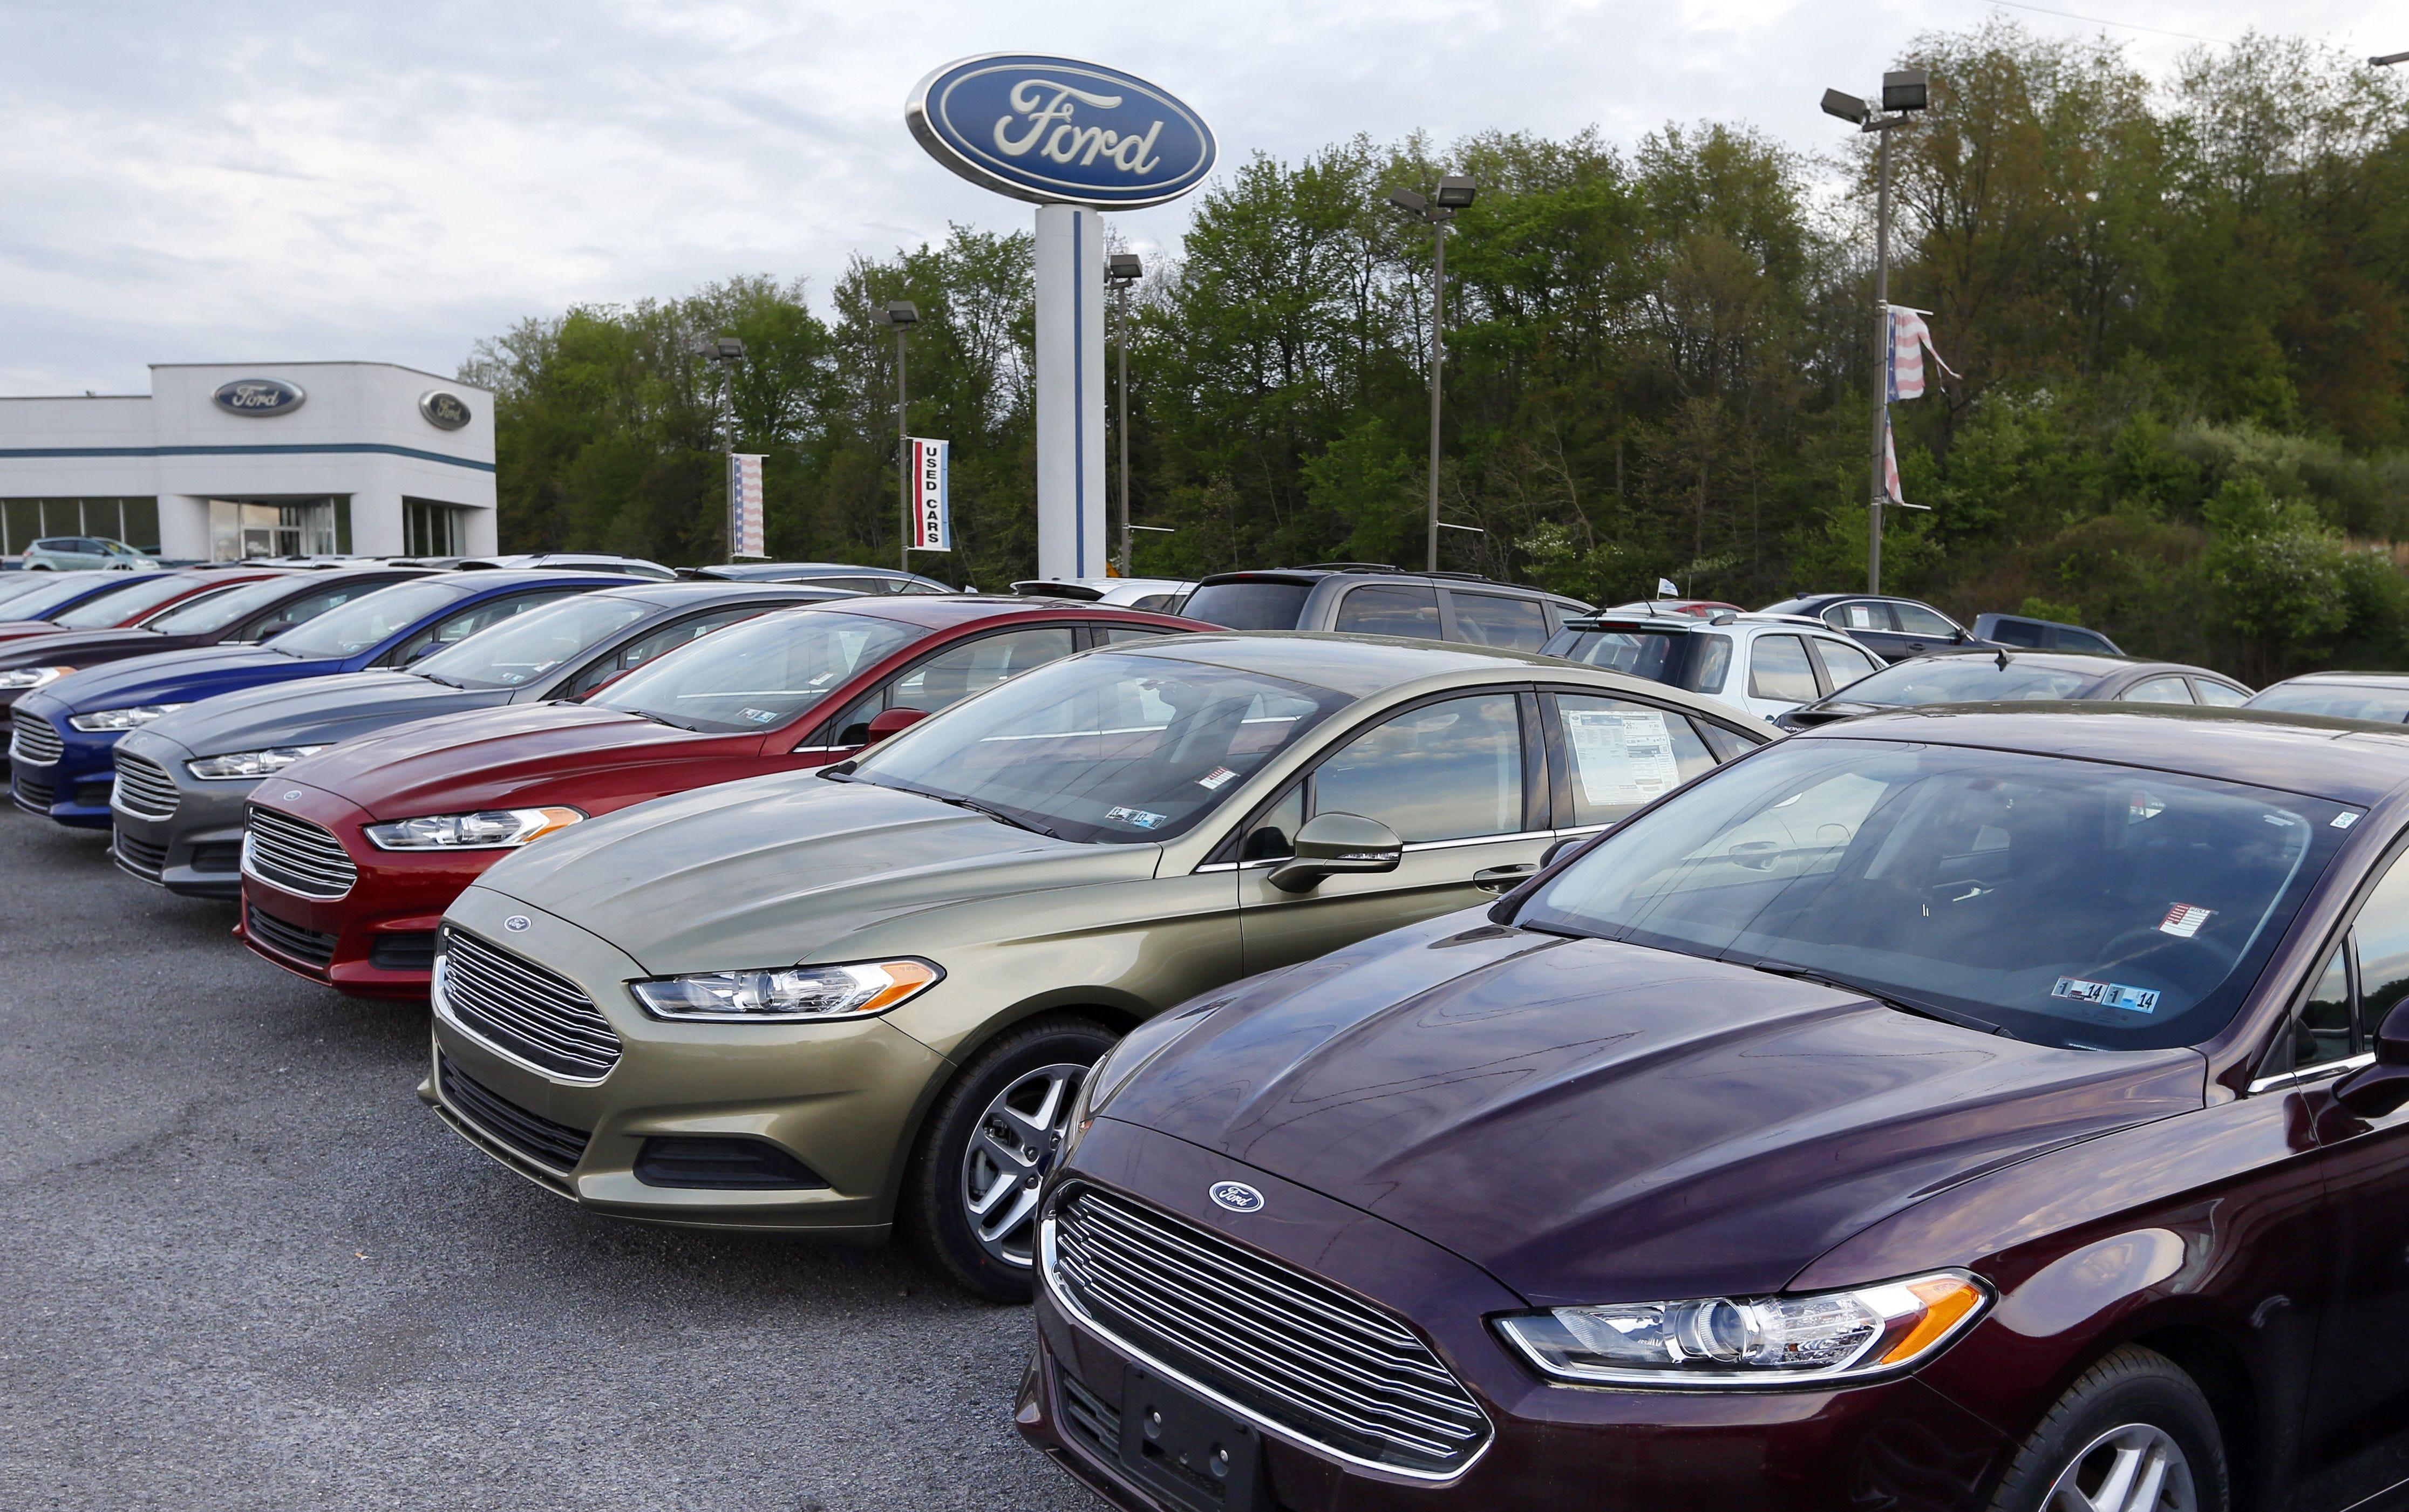 AP AUTO SALES F FILE USA PA & General Motors Ford Toyota lead the way in U.S. auto sales markmcfarlin.com